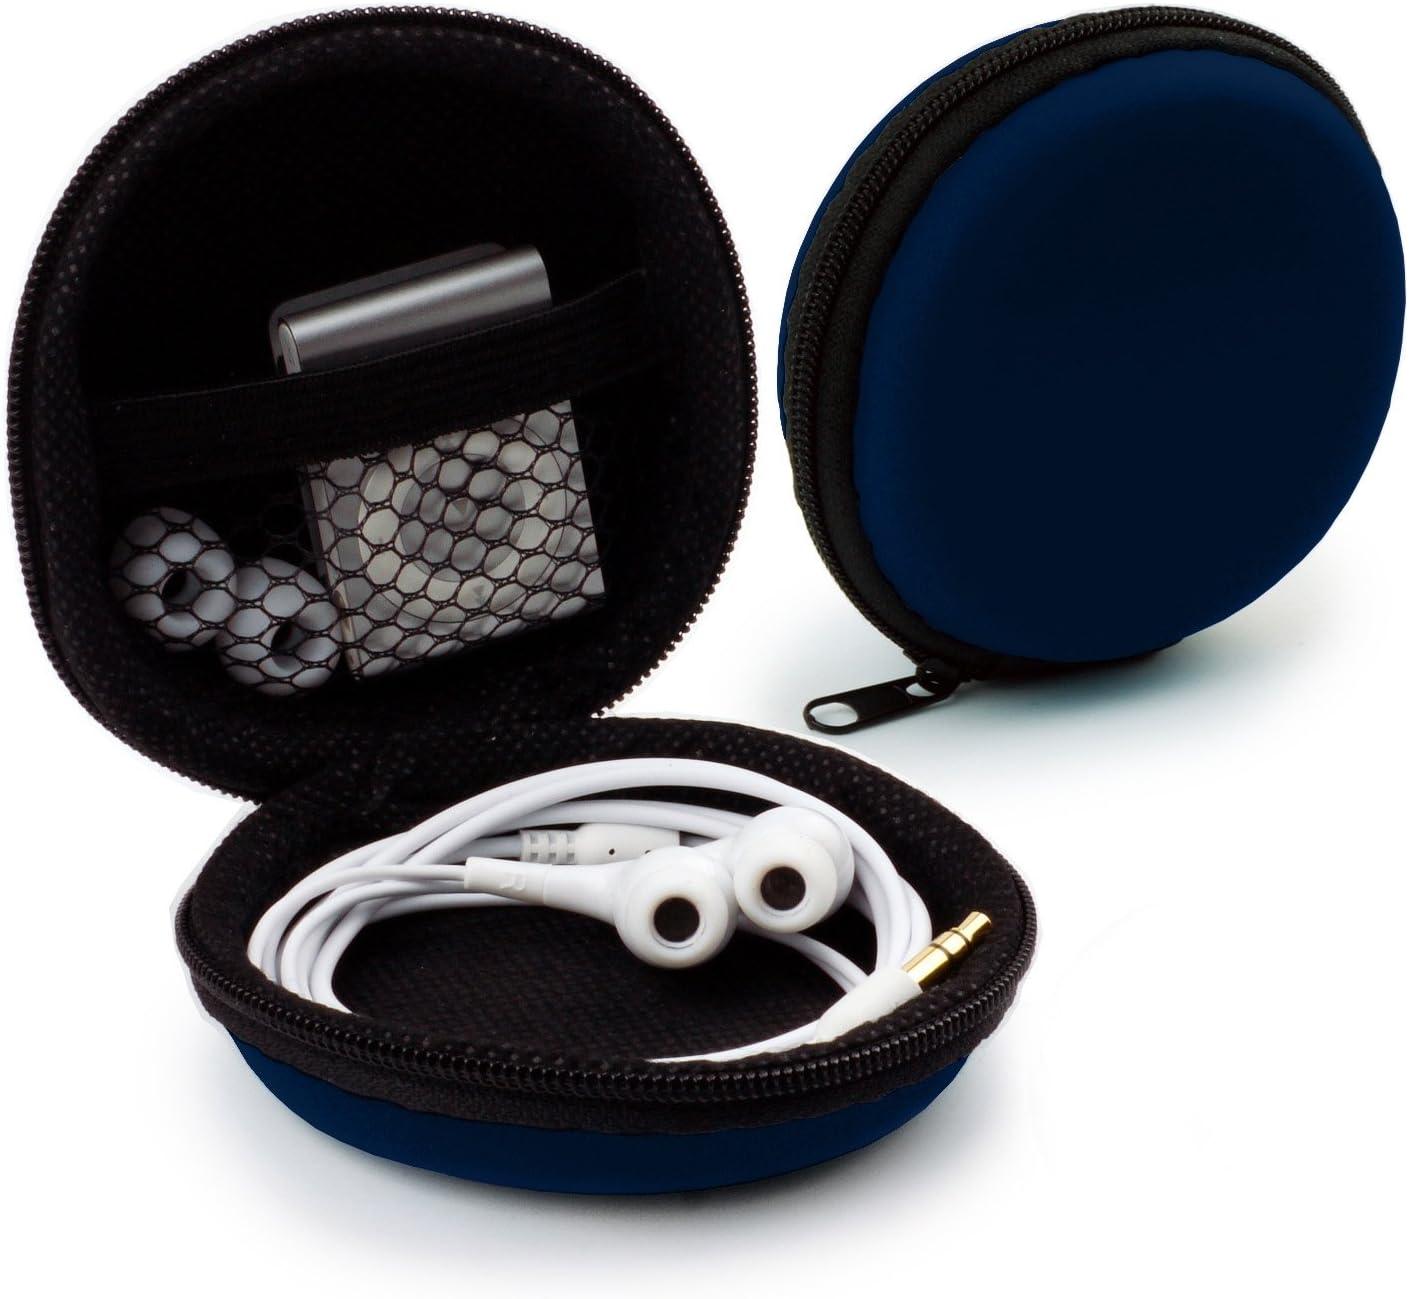 Dunkel Blau iPod Shuffle Zubeh/ör f/ür In Ear Case Ohrh/örer Mini Tasche Schutztasche Transport Box MyGadget Kopfh/örer Aufbewahrung USB Sticks